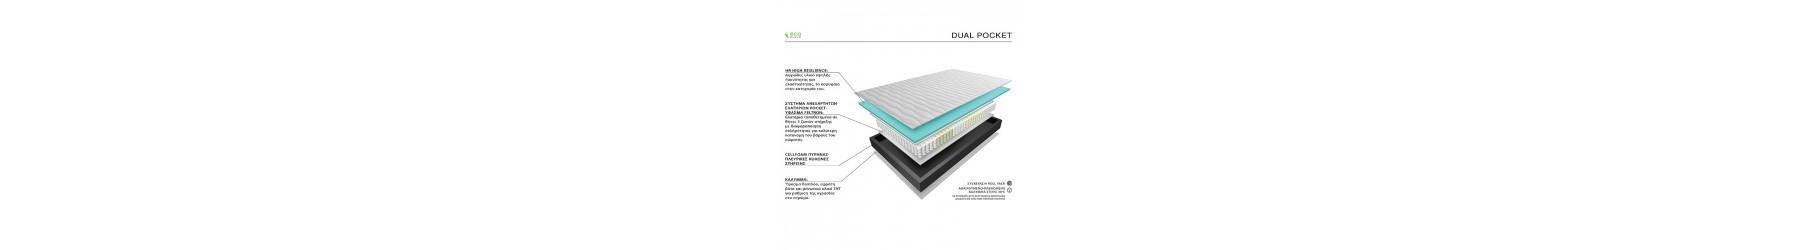 DUAL POCKET Στρώματα με ανατομικό και ορθοπεδικό σχεδιασμό